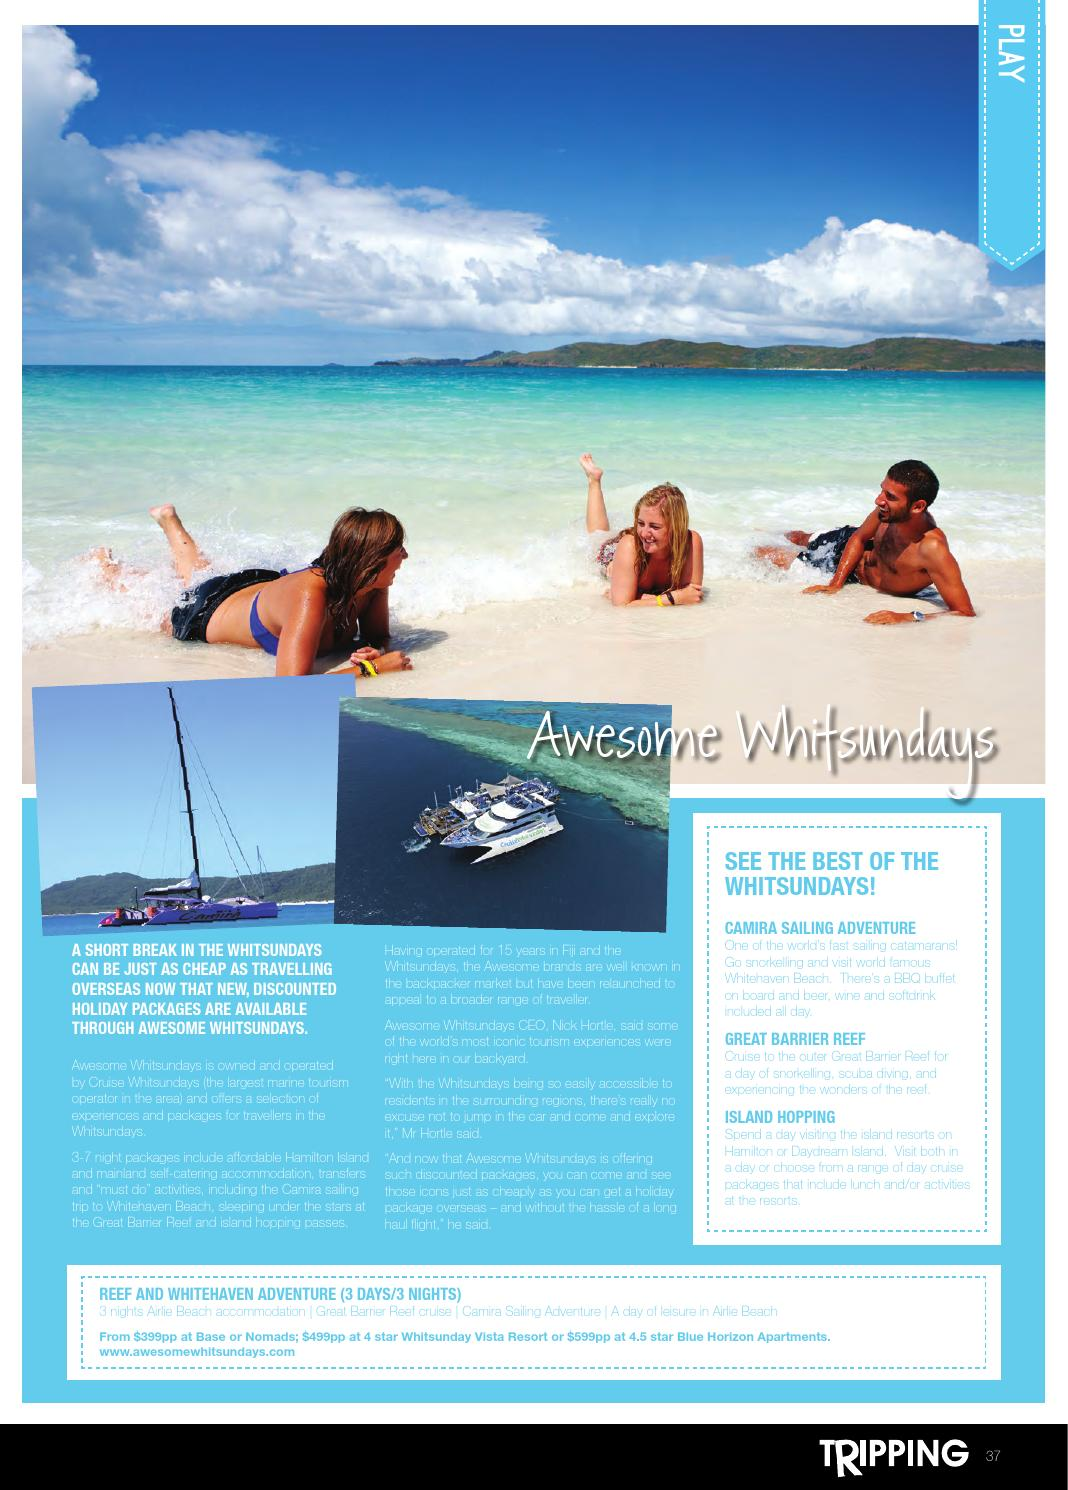 TRIPPING Magazine by CORELife Magazine - issuu